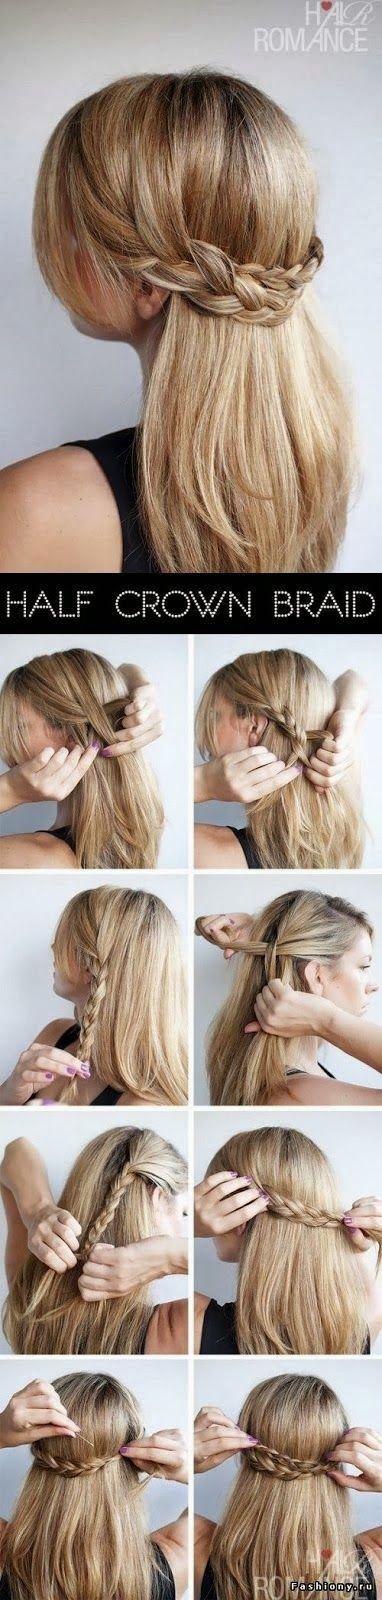 Half Crown Braid Style